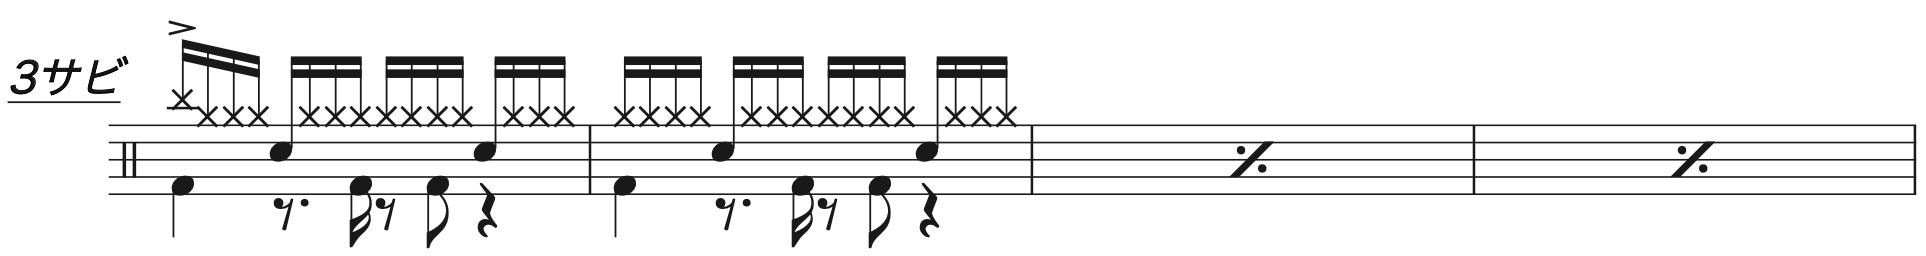 Pretender,ドラム完コピ楽譜3